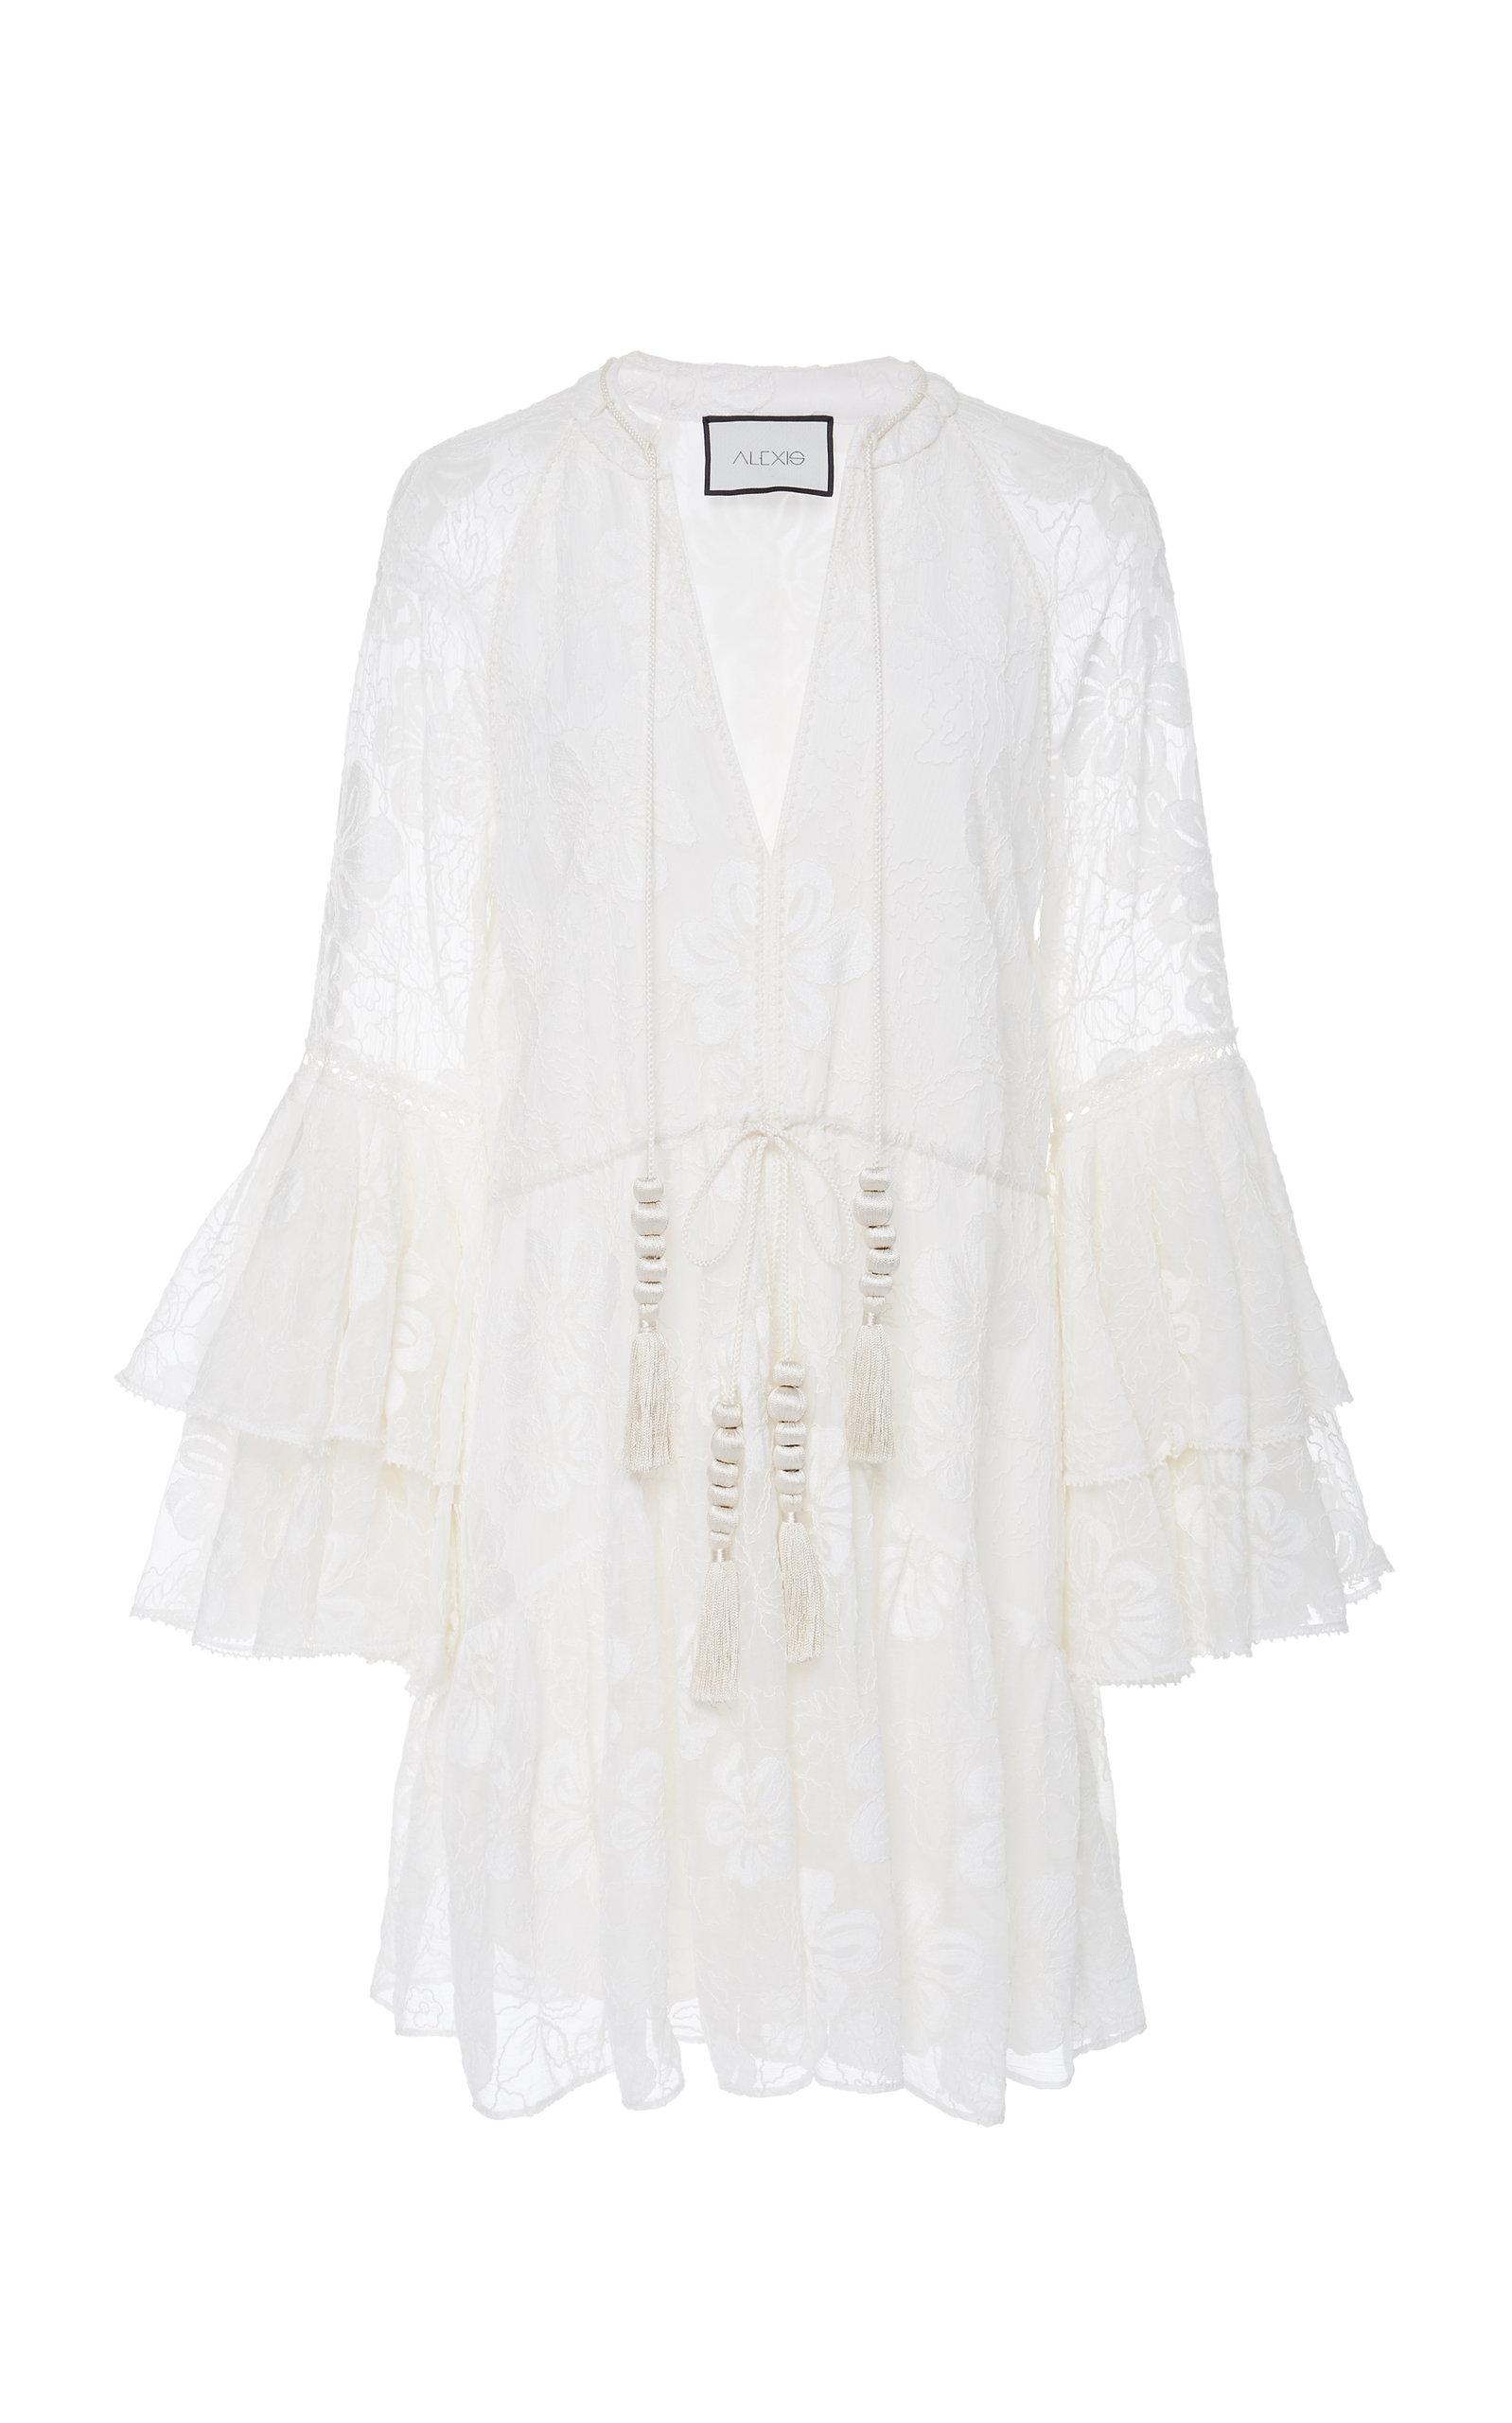 0e279ec03cdb Floriane Ruffled Lace Mini Dress by Alexis | Moda Operandi